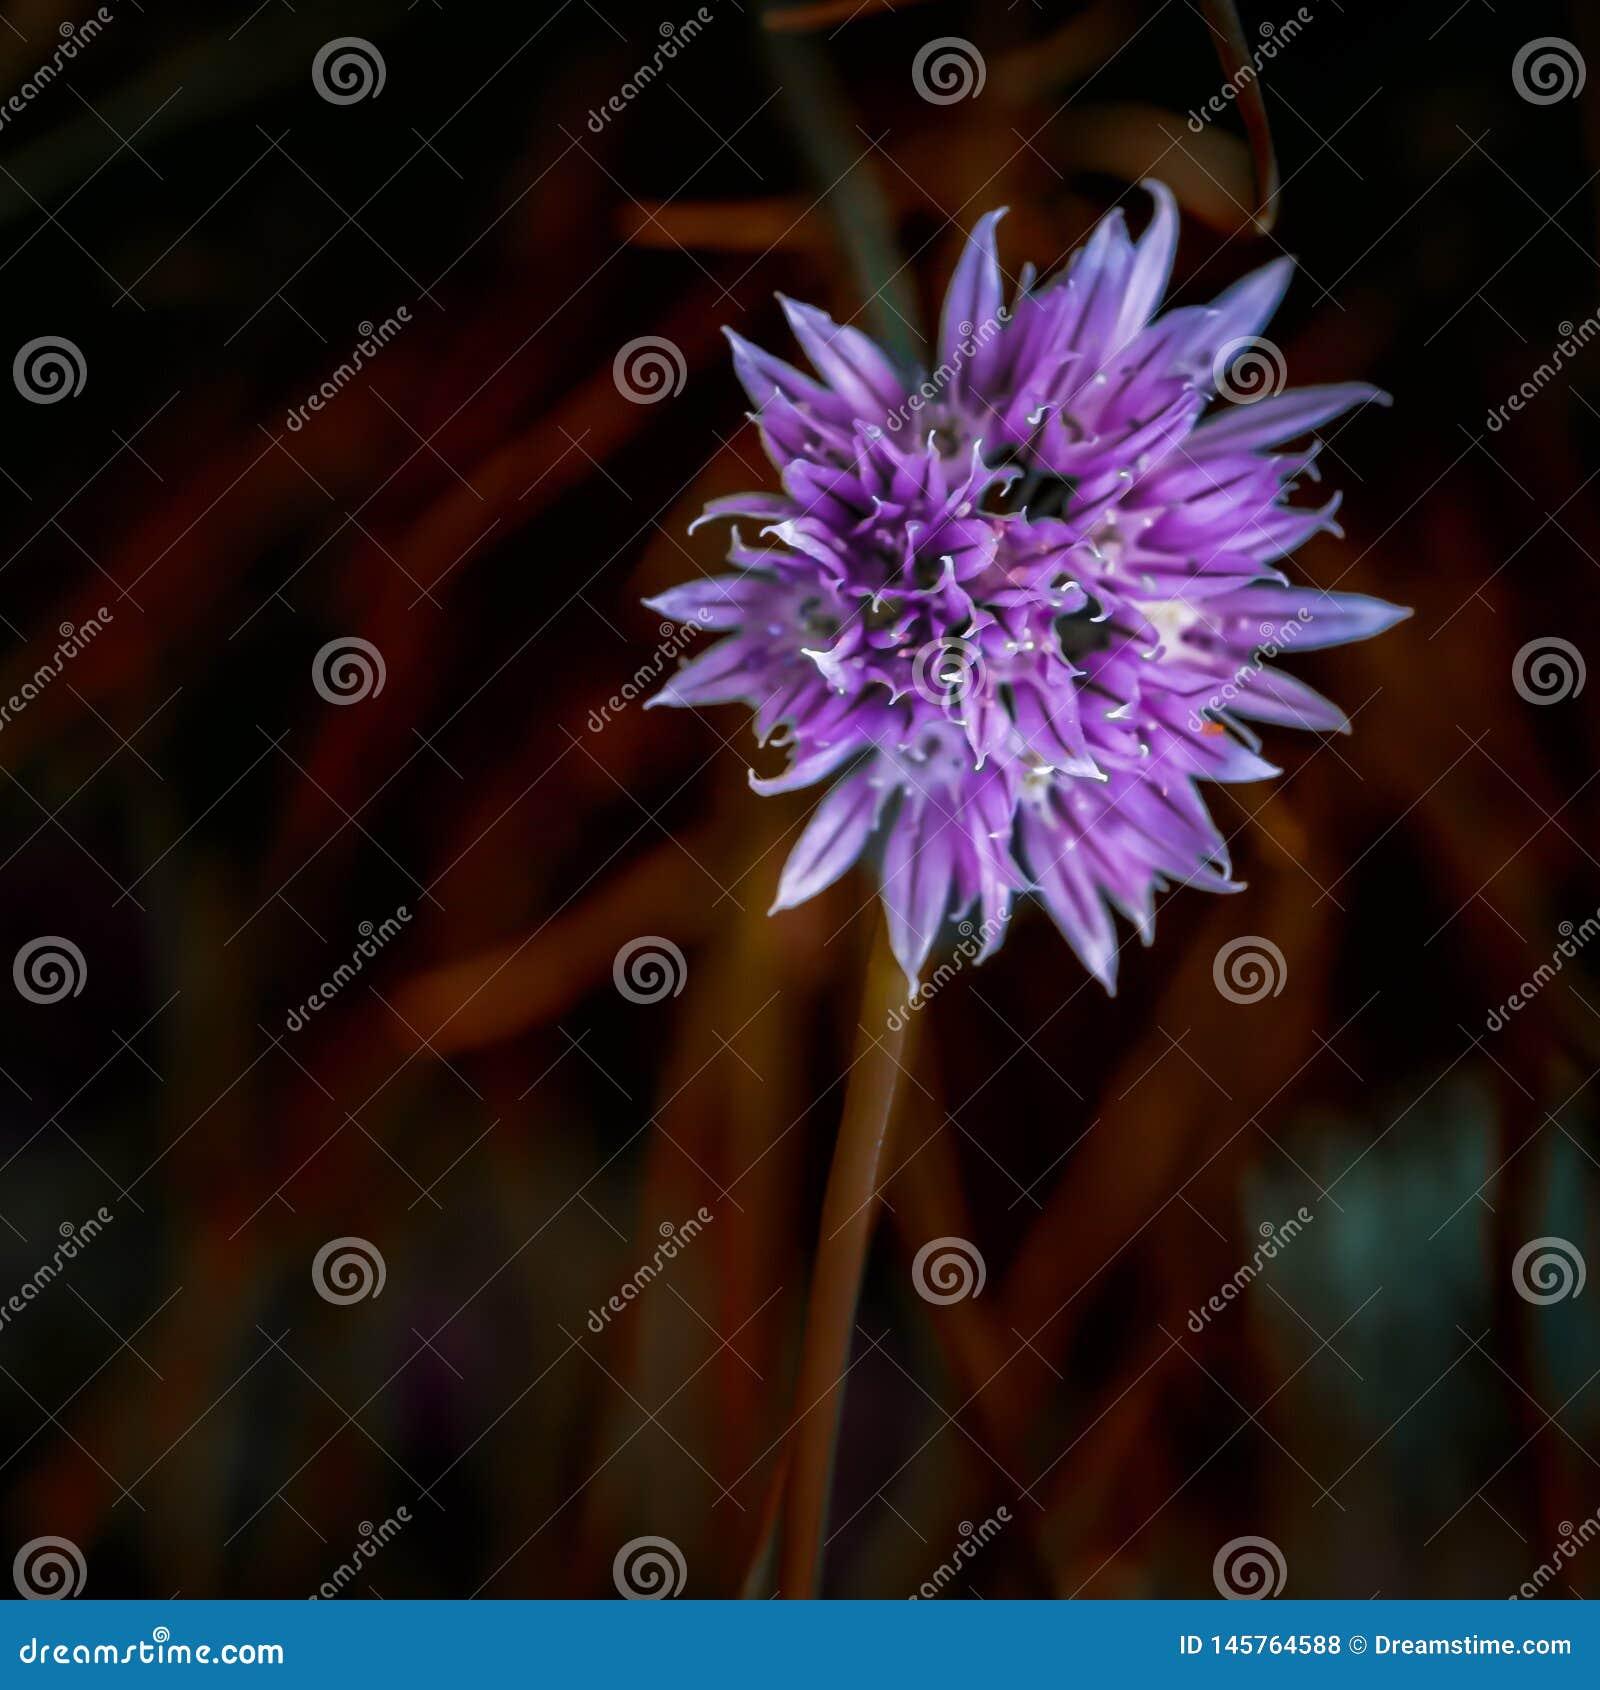 Fioletowy kwiat g?owy